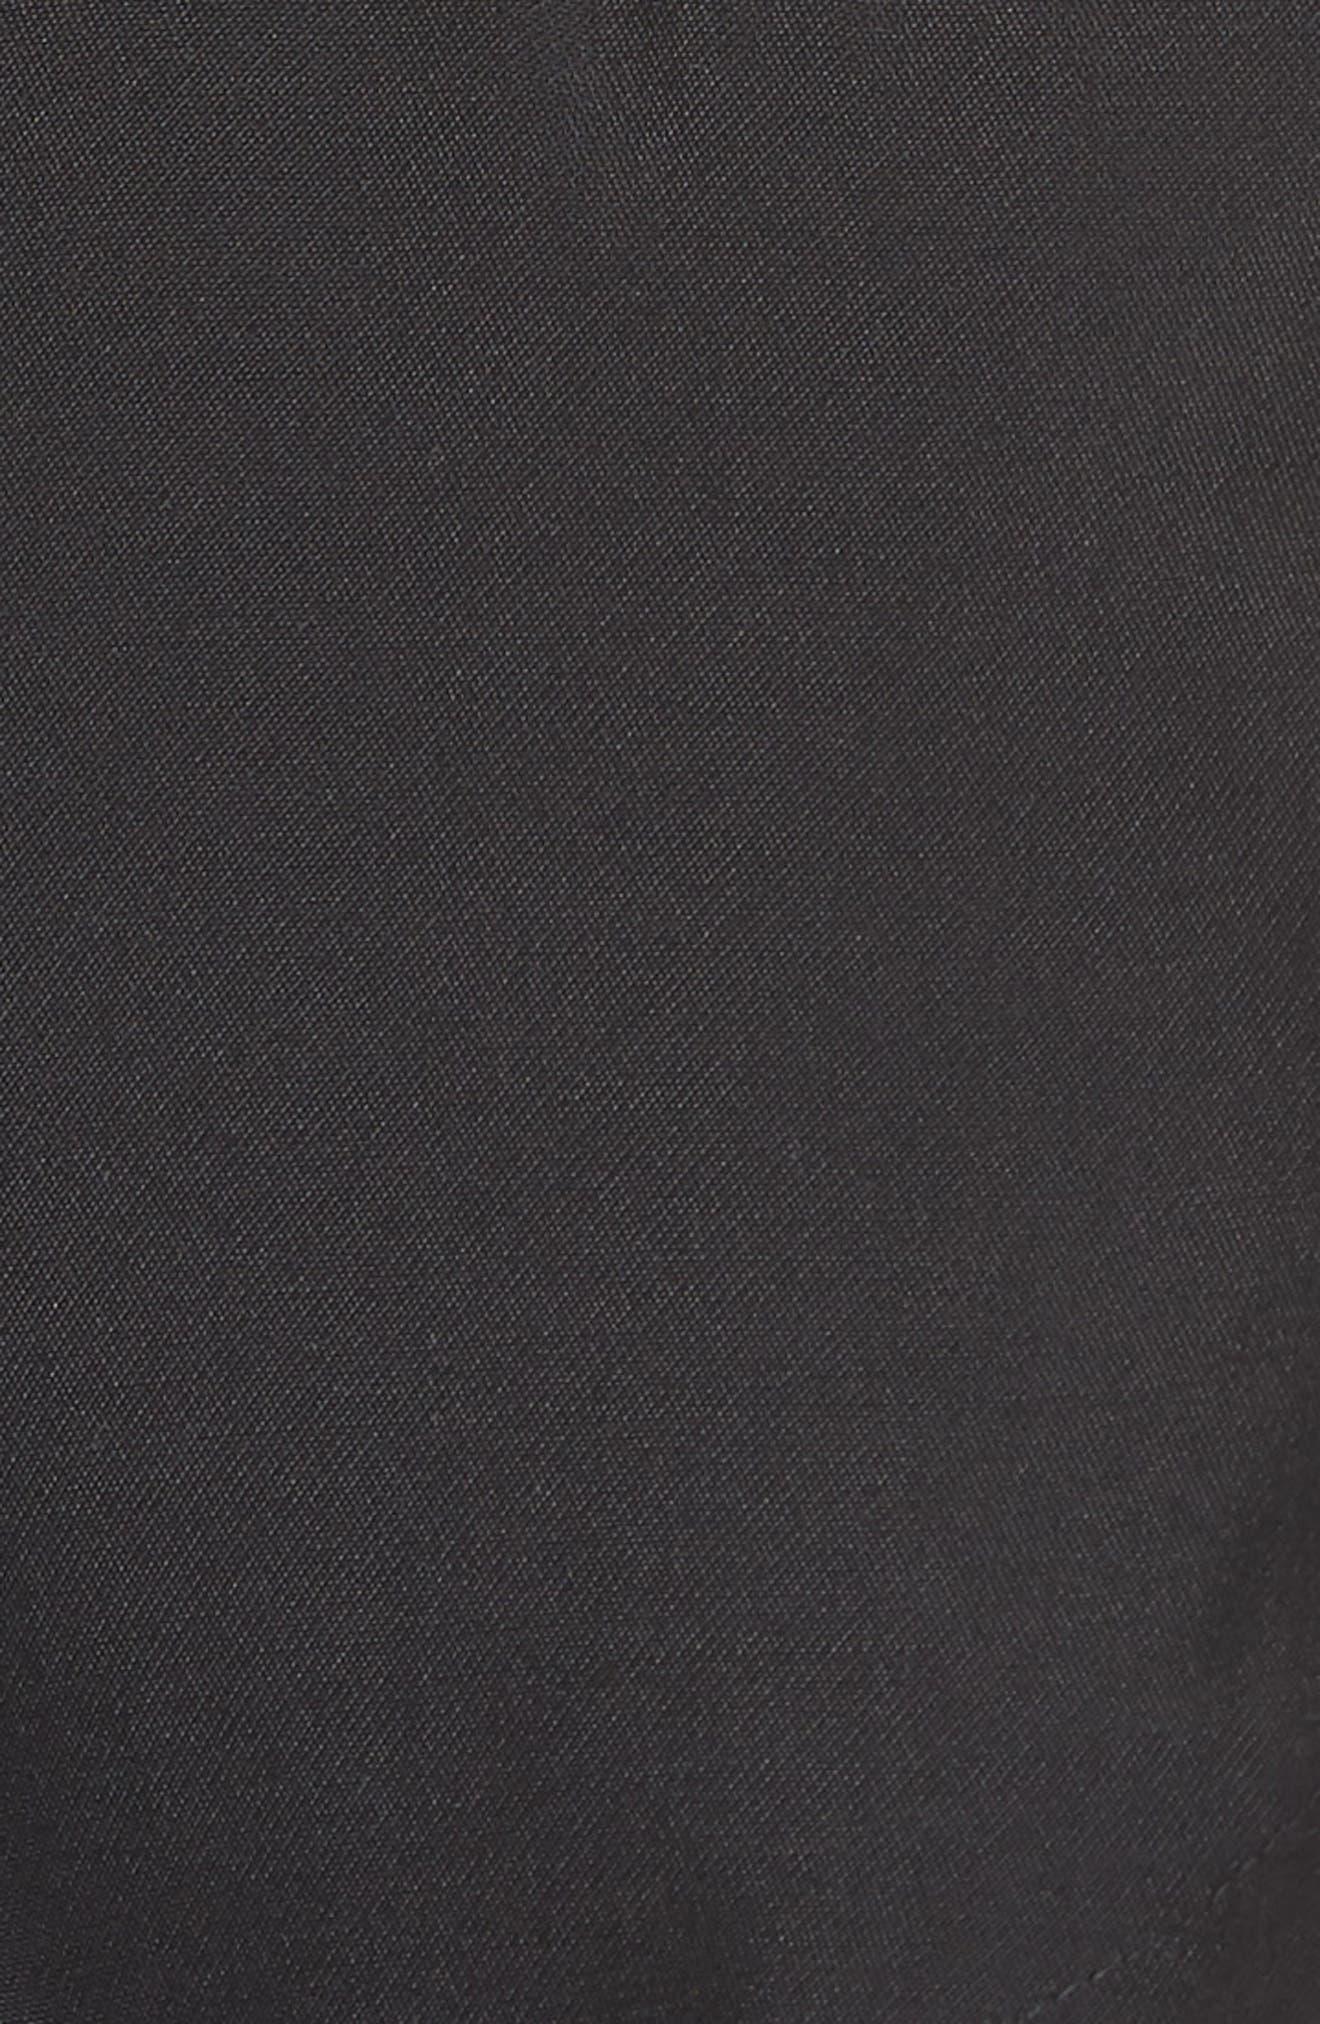 Belted Sleeveless Jacket,                             Alternate thumbnail 6, color,                             Black